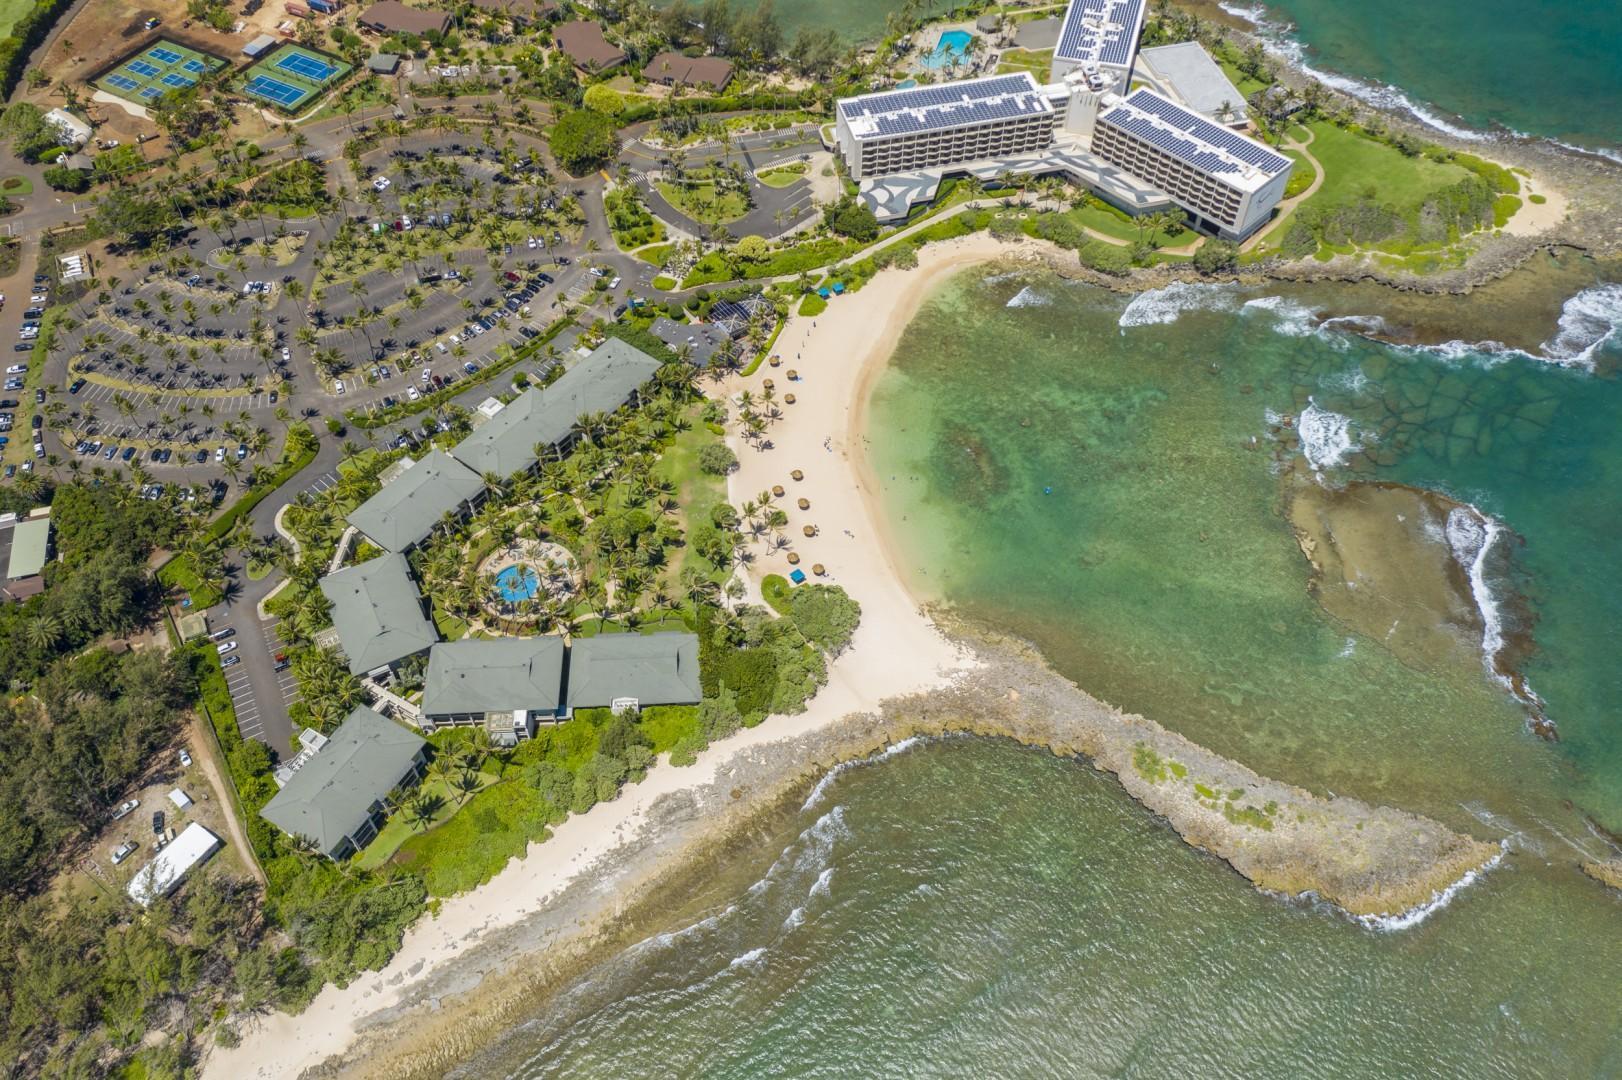 Aerial view of the Ocean Villas and Turtle Bay Resort